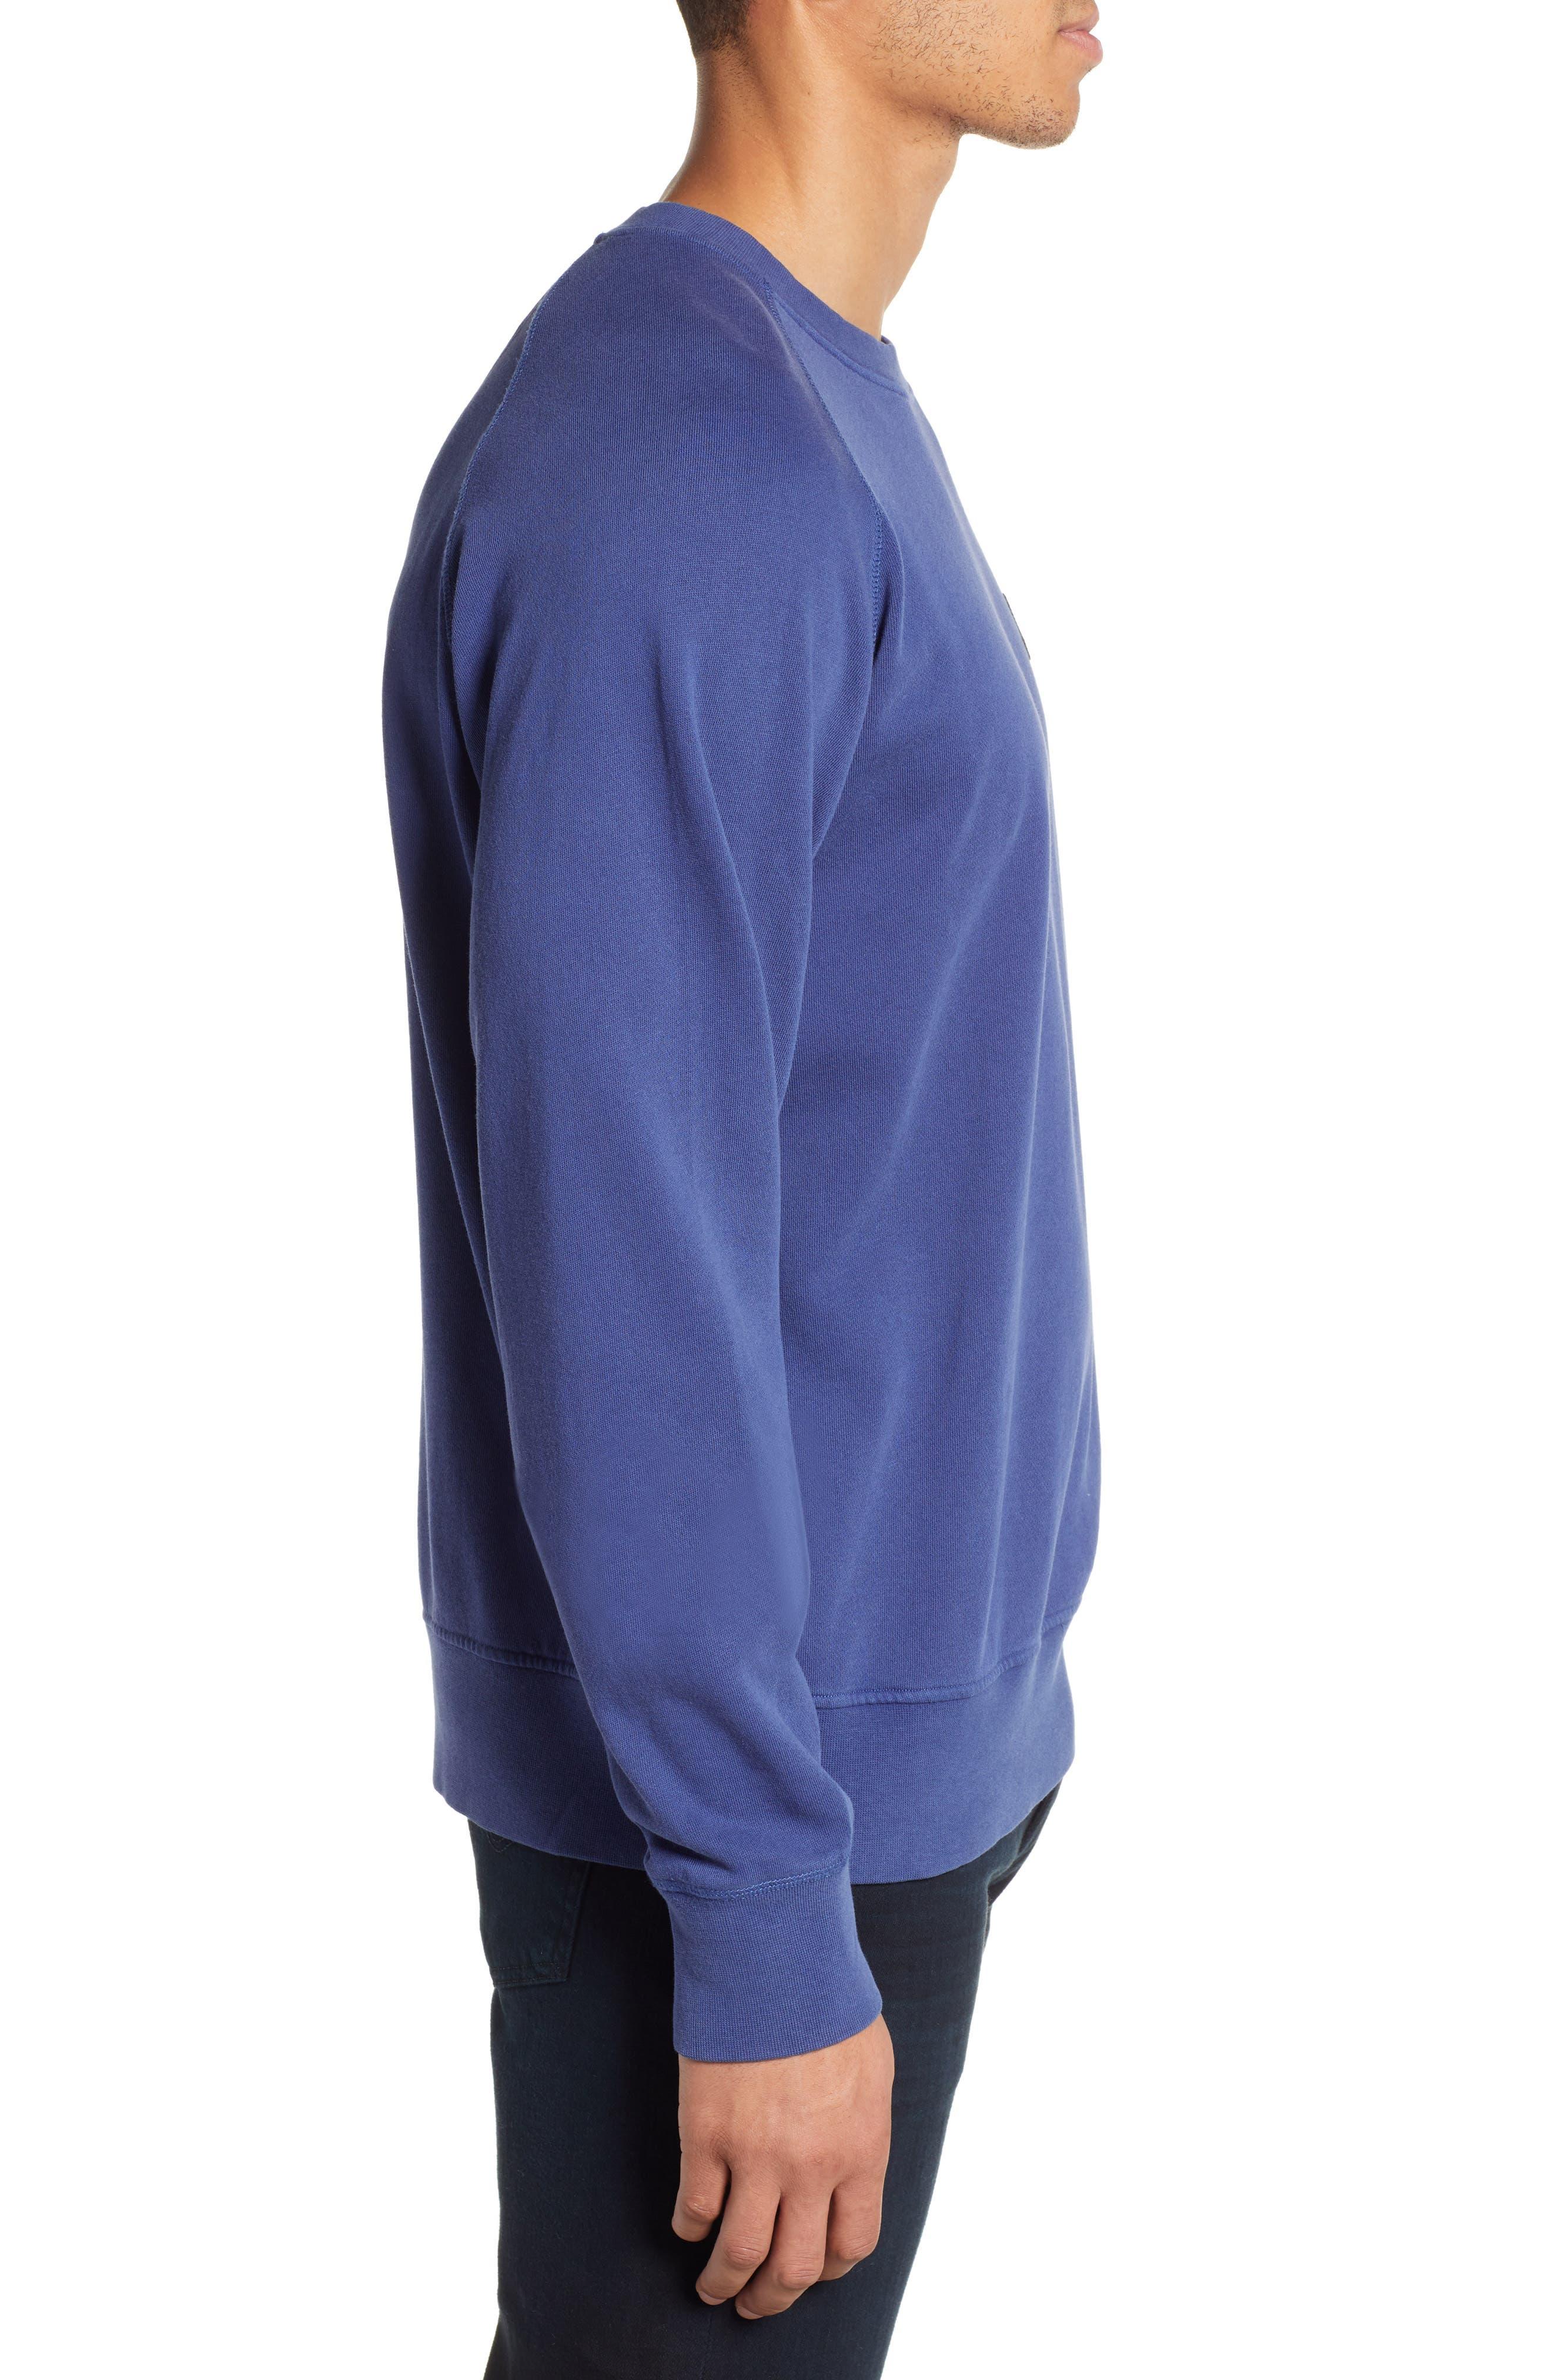 Dunham Crewneck Sweatshirt,                             Alternate thumbnail 3, color,                             BLUE PRINT